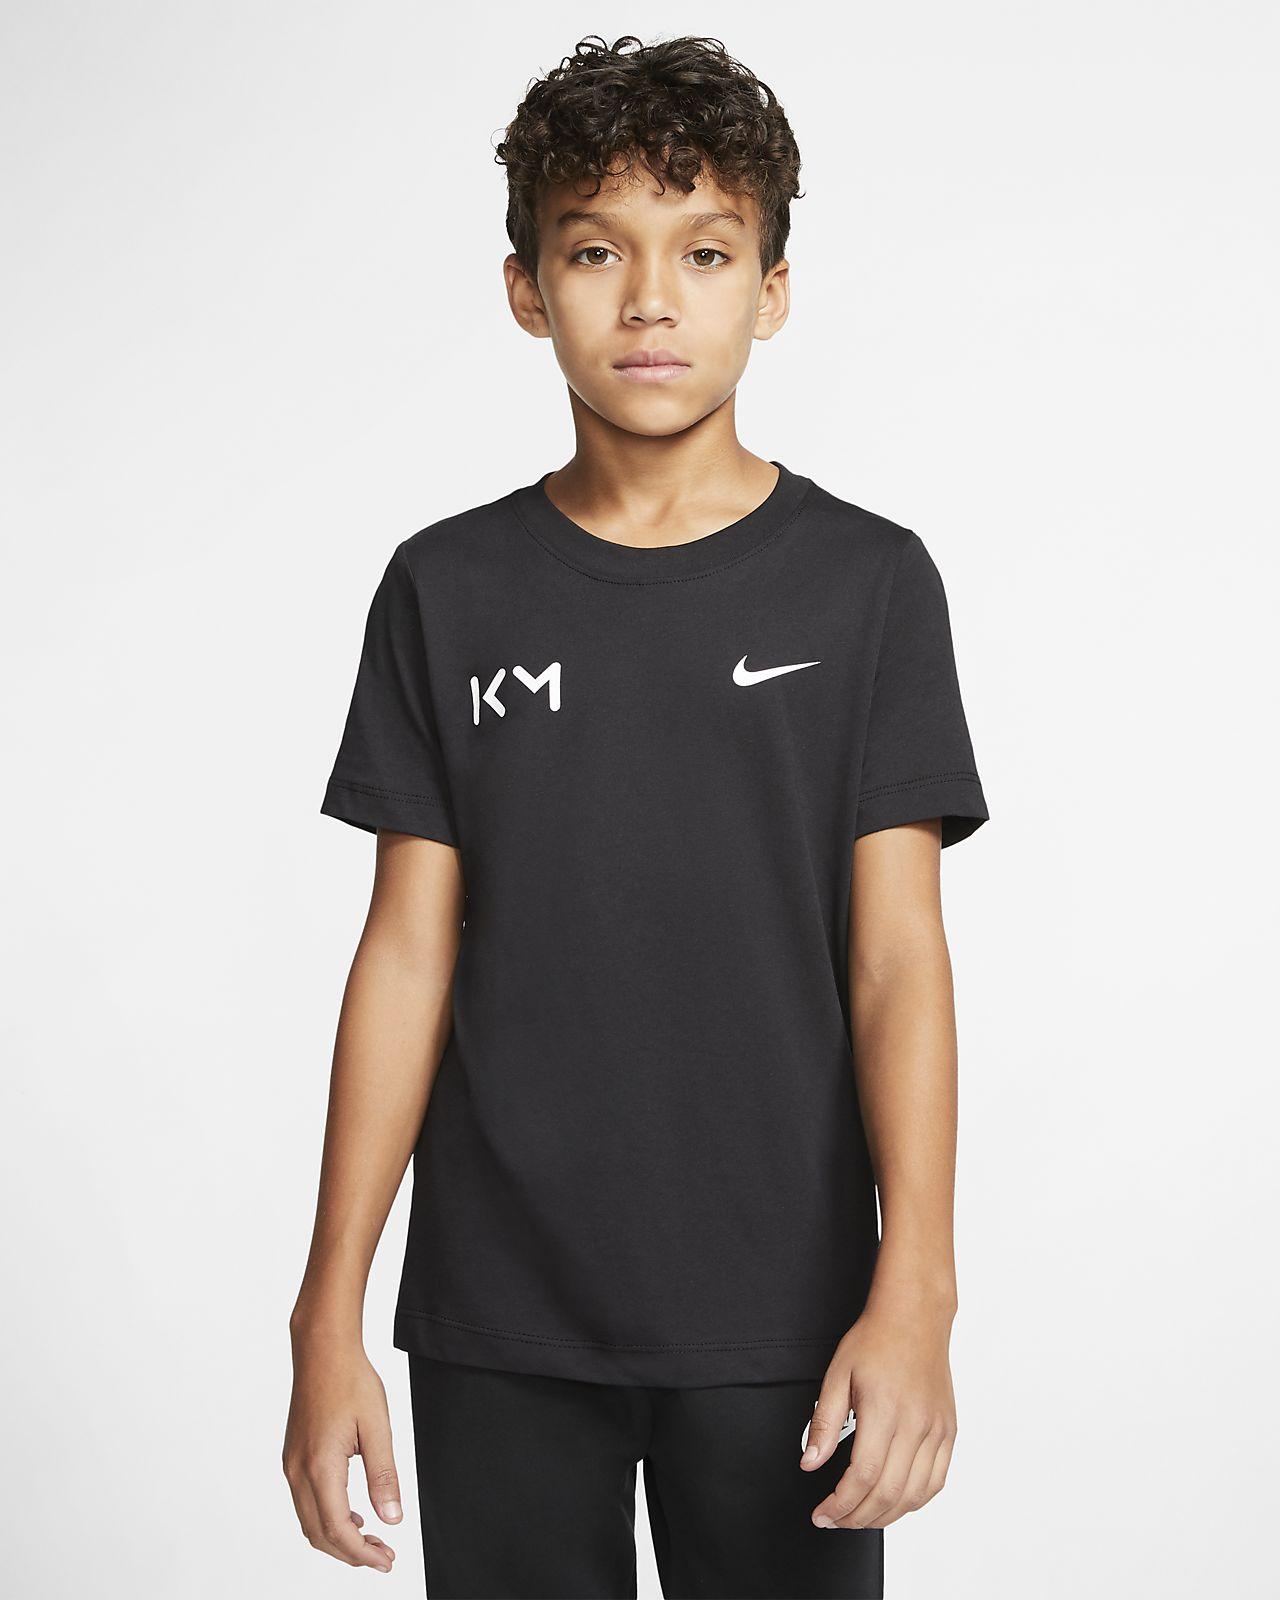 Kylian Mbappé Older Kids' Football T-Shirt